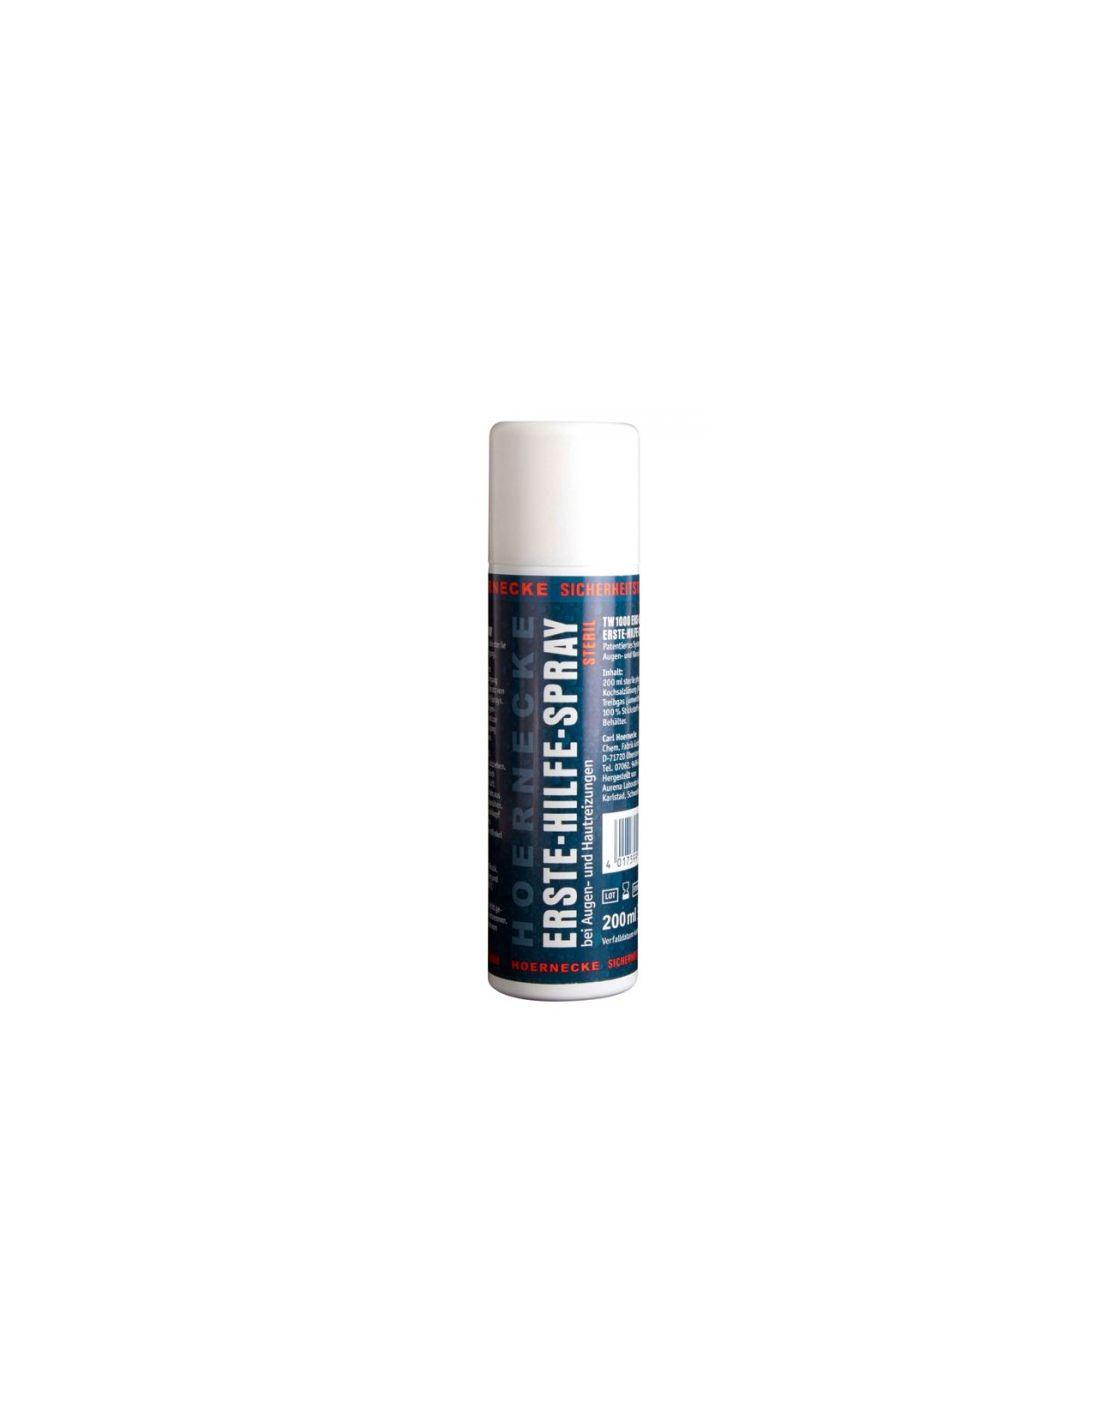 hoernecke-erste-hilfe-spray-200ml.jpg